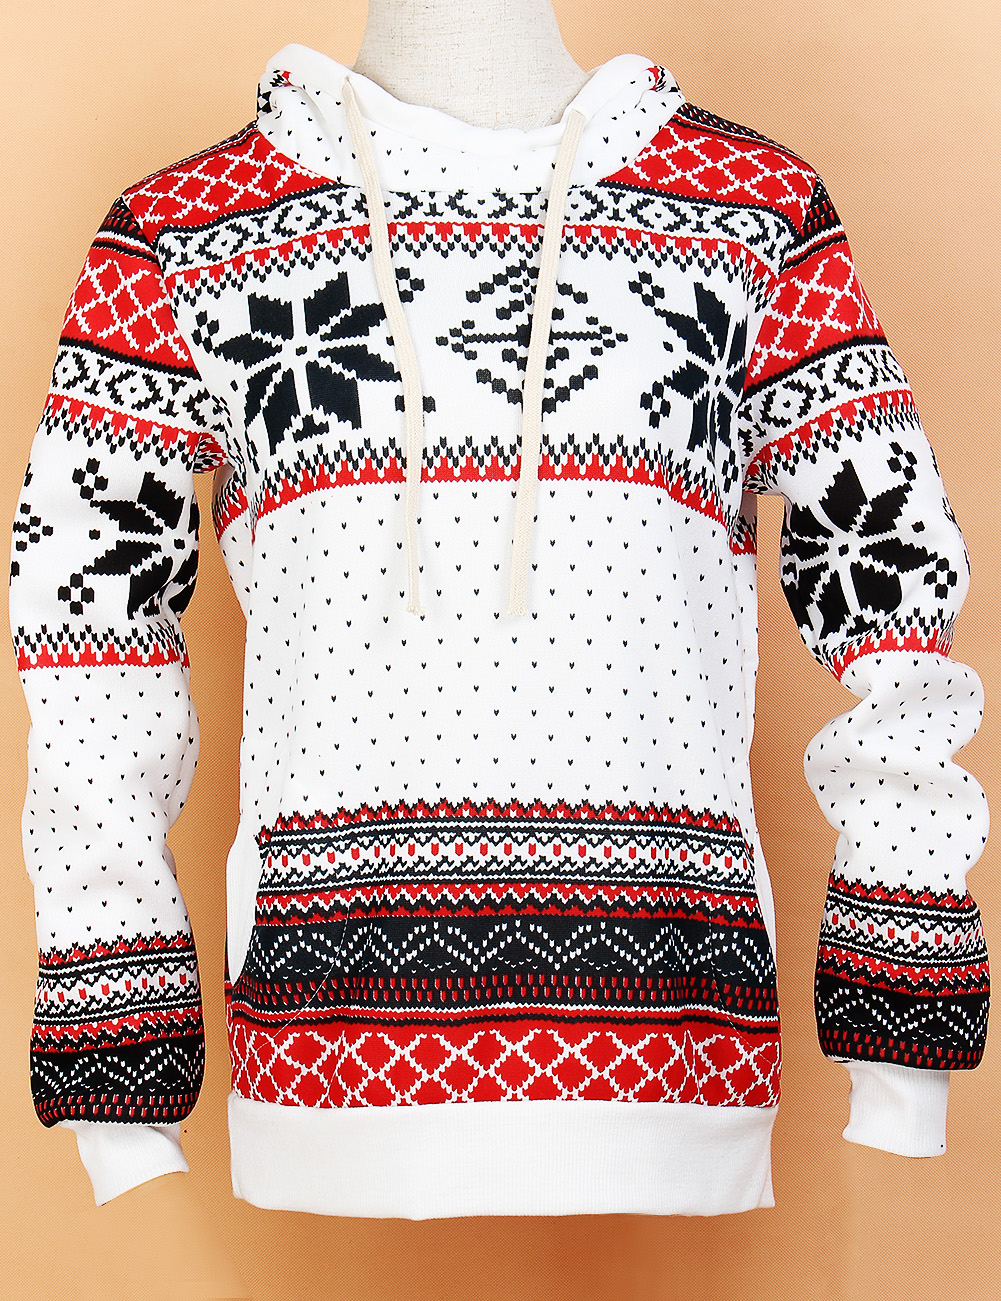 1pc Fashion Womens Snowflake Hooded Sweater Hoody Christmas Sportwear Harajuku Snowflake Printed Sweatshirt Pullover